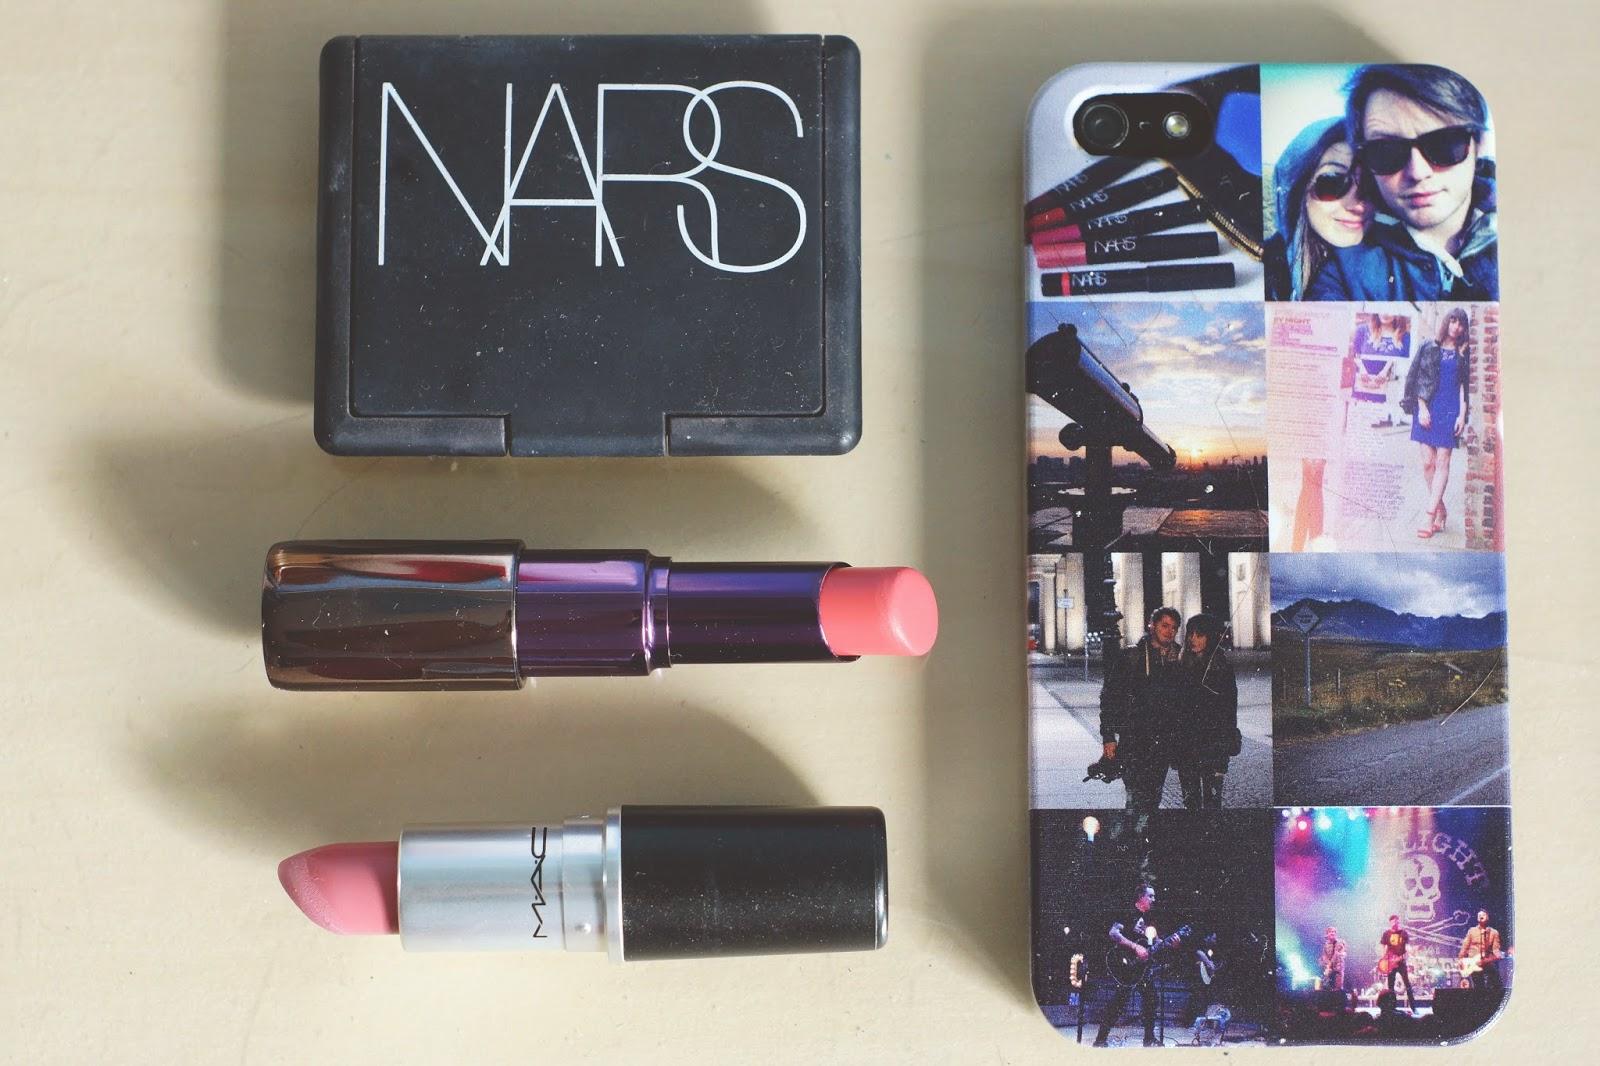 Nars blush, MAC lipstick, Urban Decay lipstick, iphone5